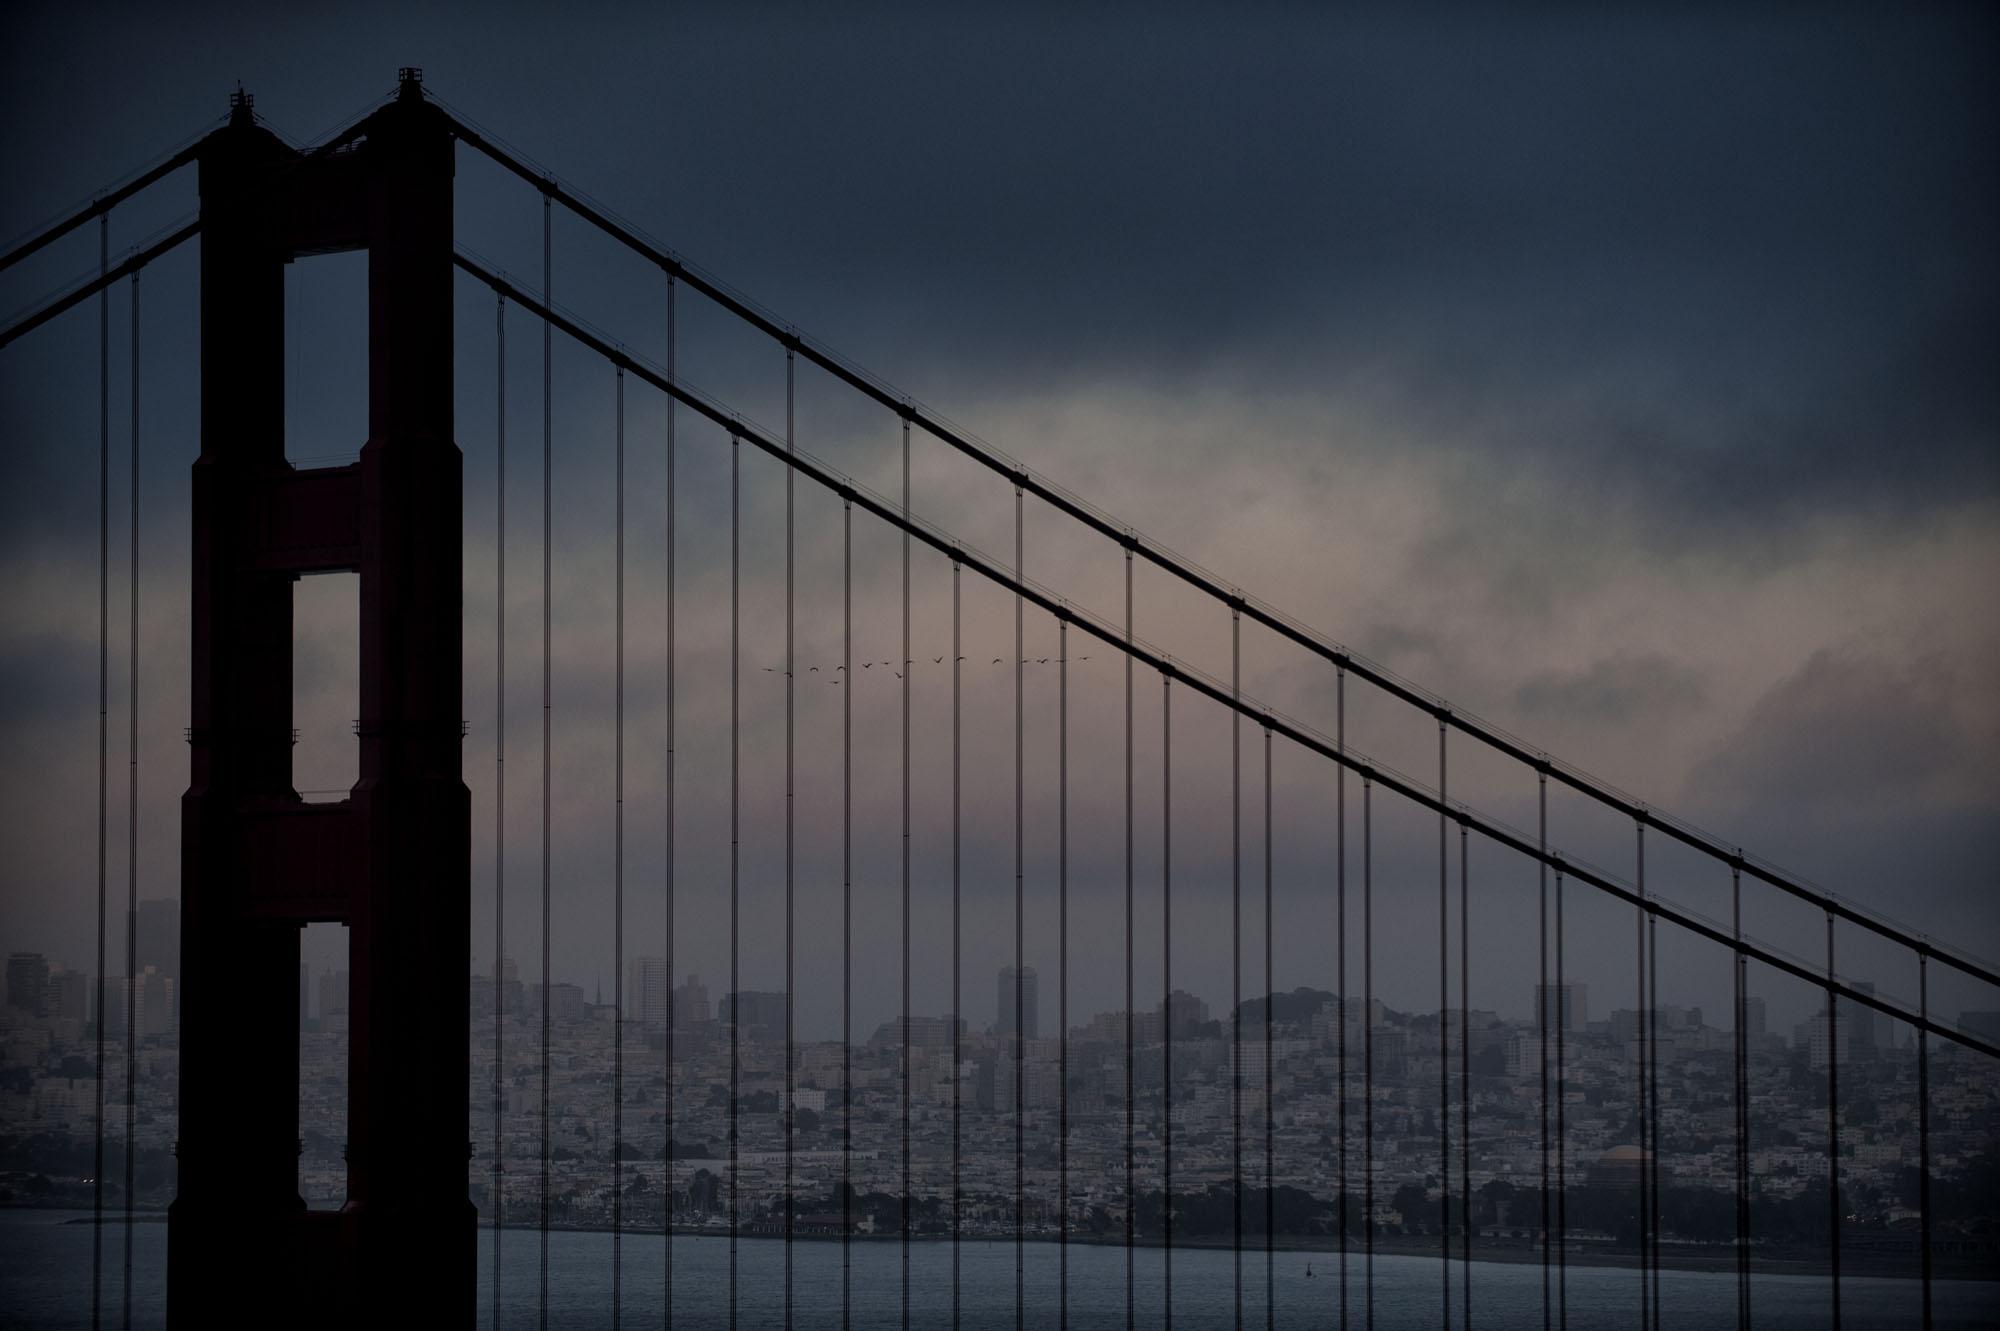 Golden Gate. San Francisco, CA.